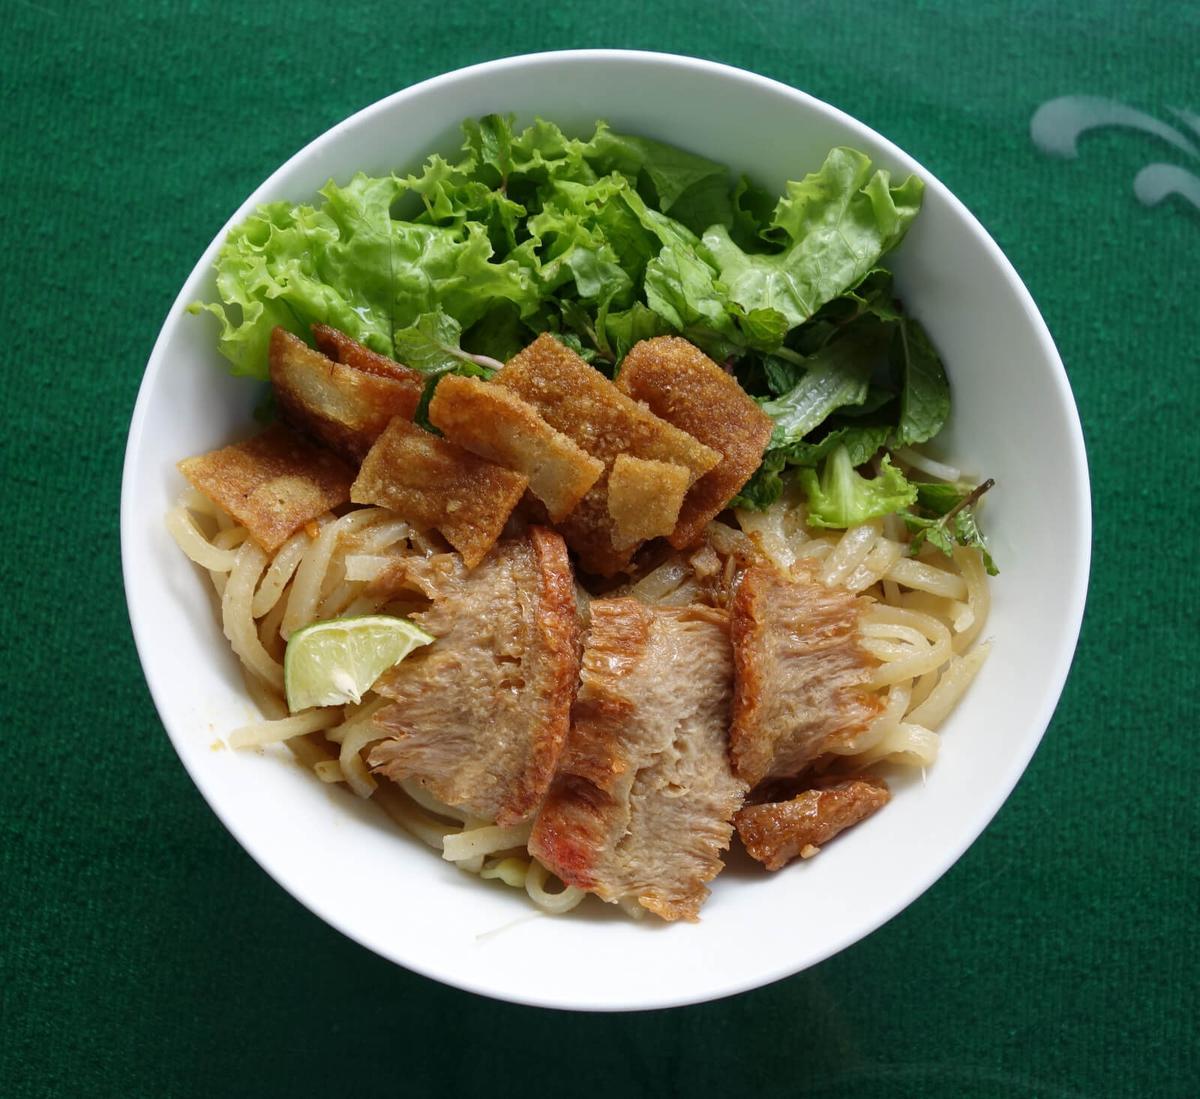 Best Vegetarian Restaurant in Hoi An, Vietnam